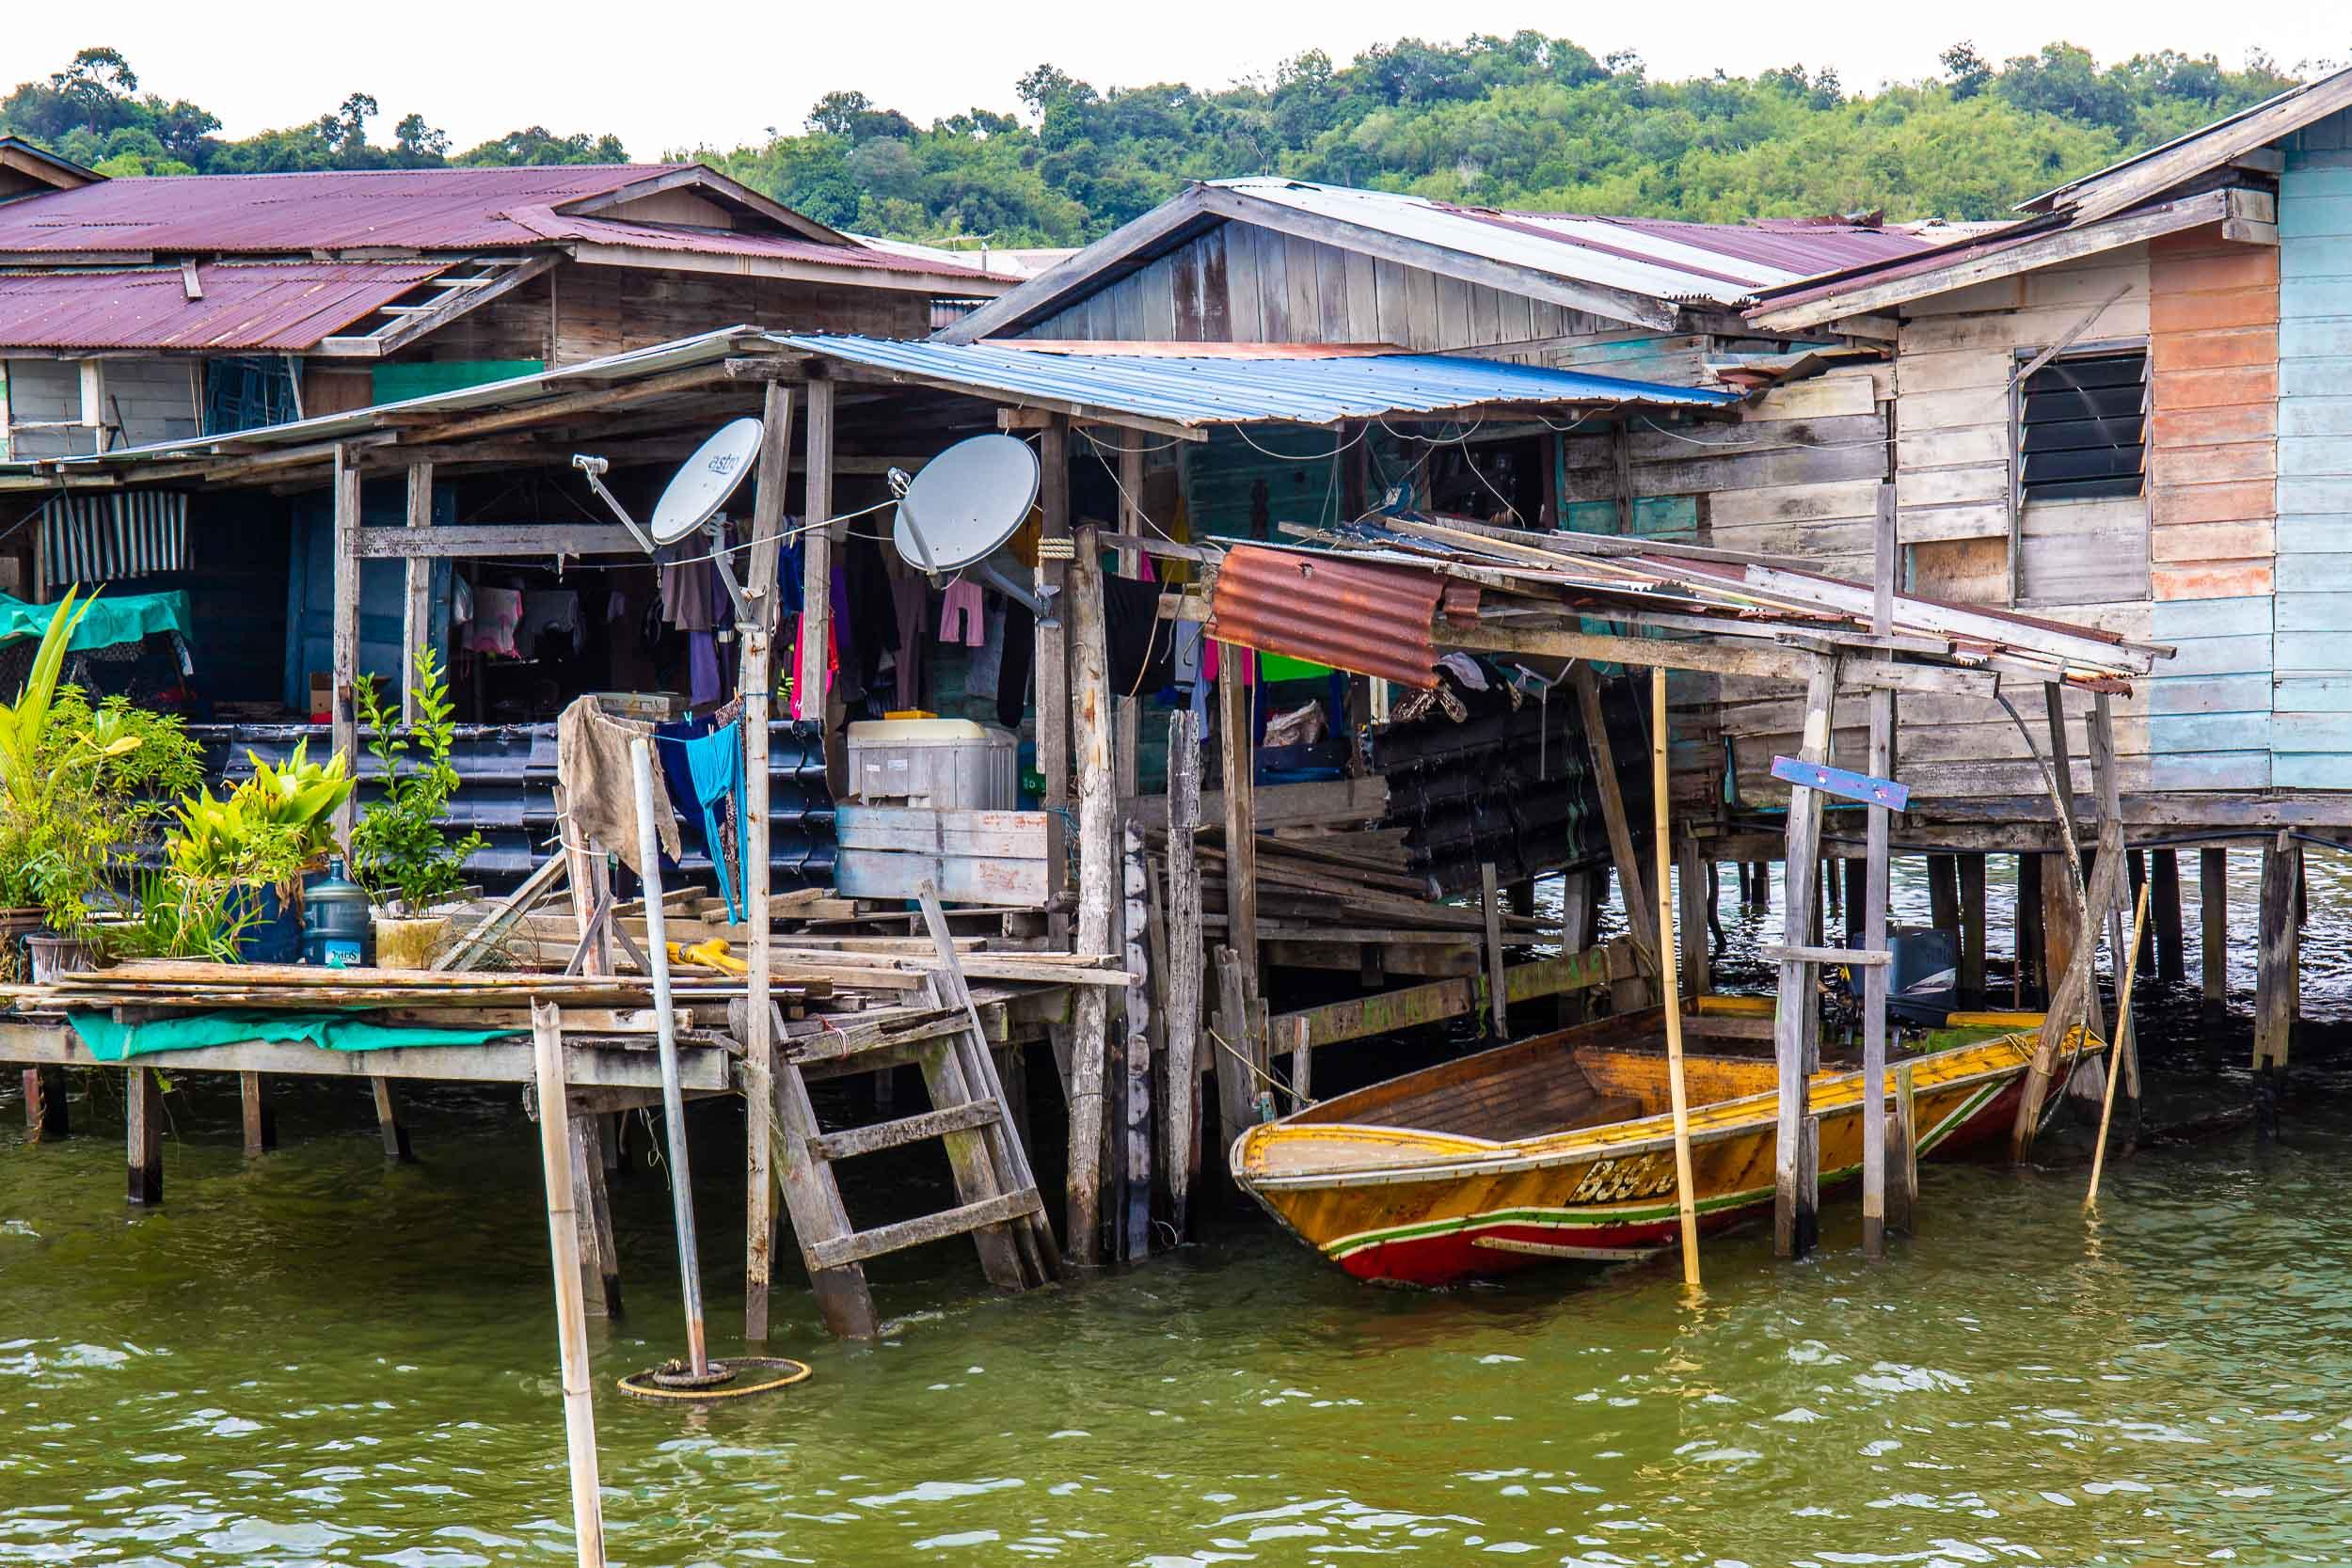 Local mode of transport, Kampong Ayer, Bandar Seri Begawan, Brunei